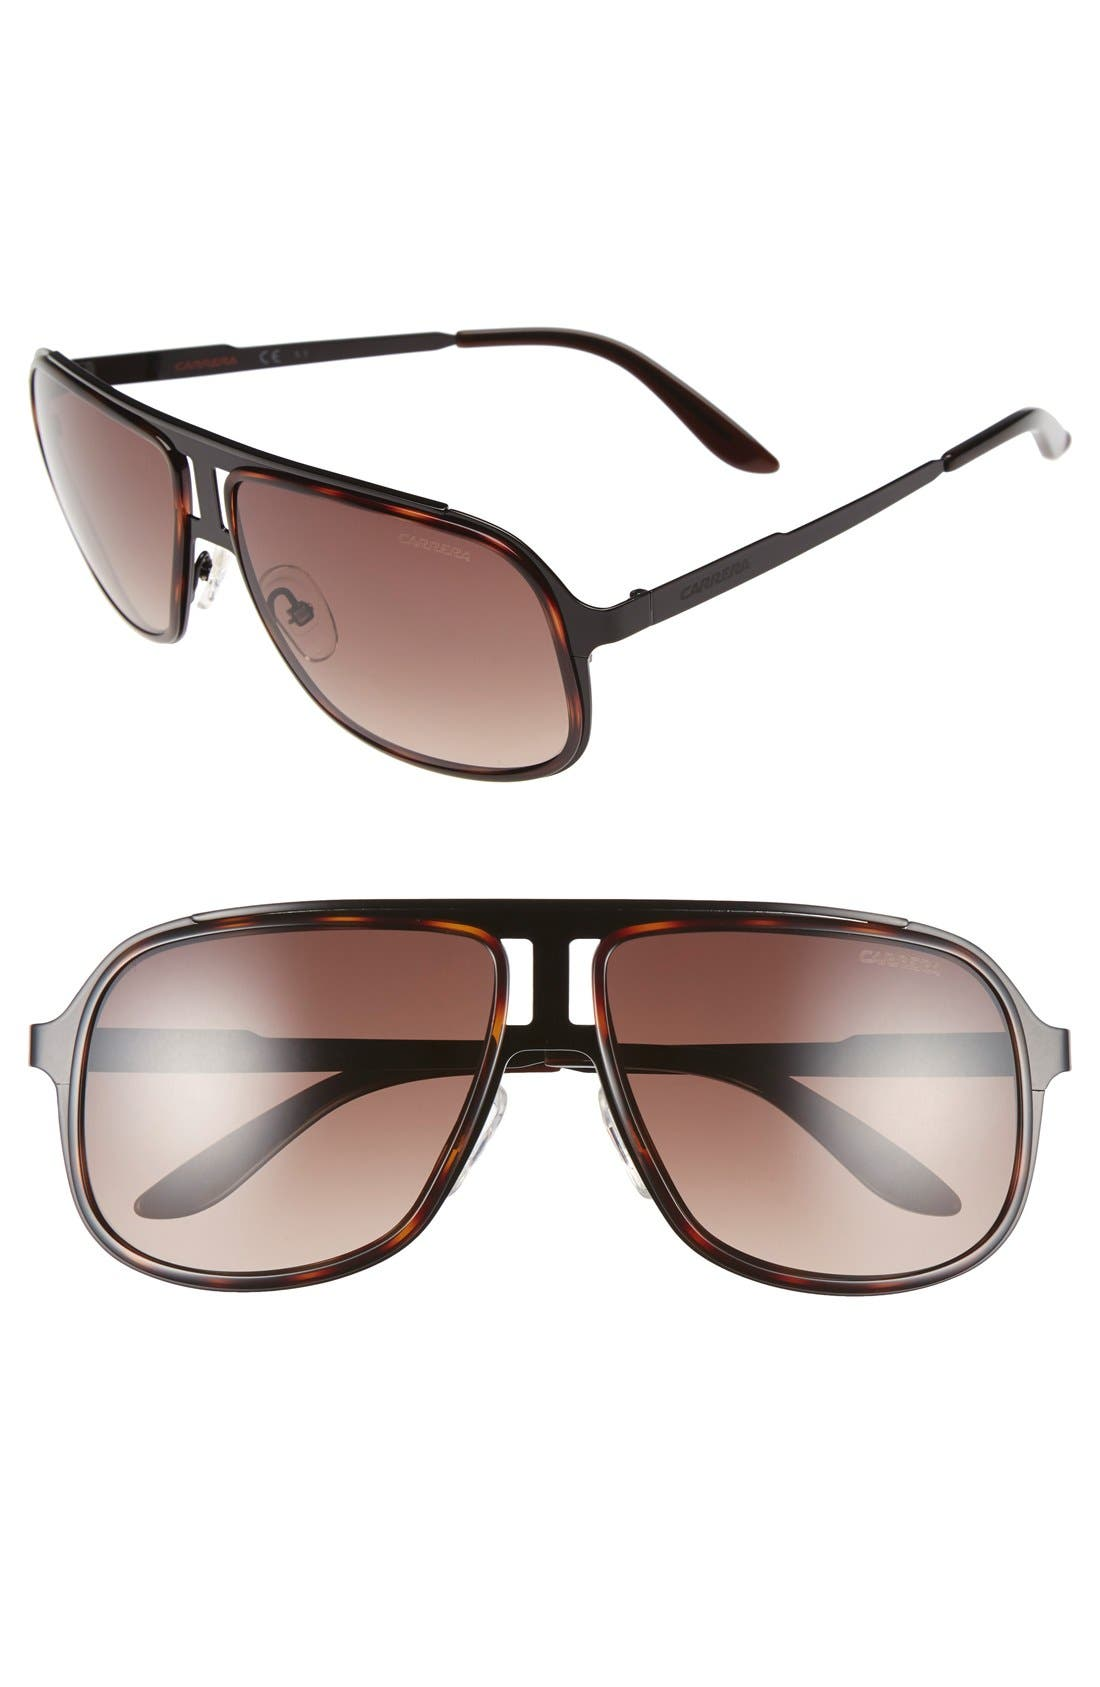 59mm Aviator Sunglasses,                             Main thumbnail 1, color,                             Black Havana/ Brown